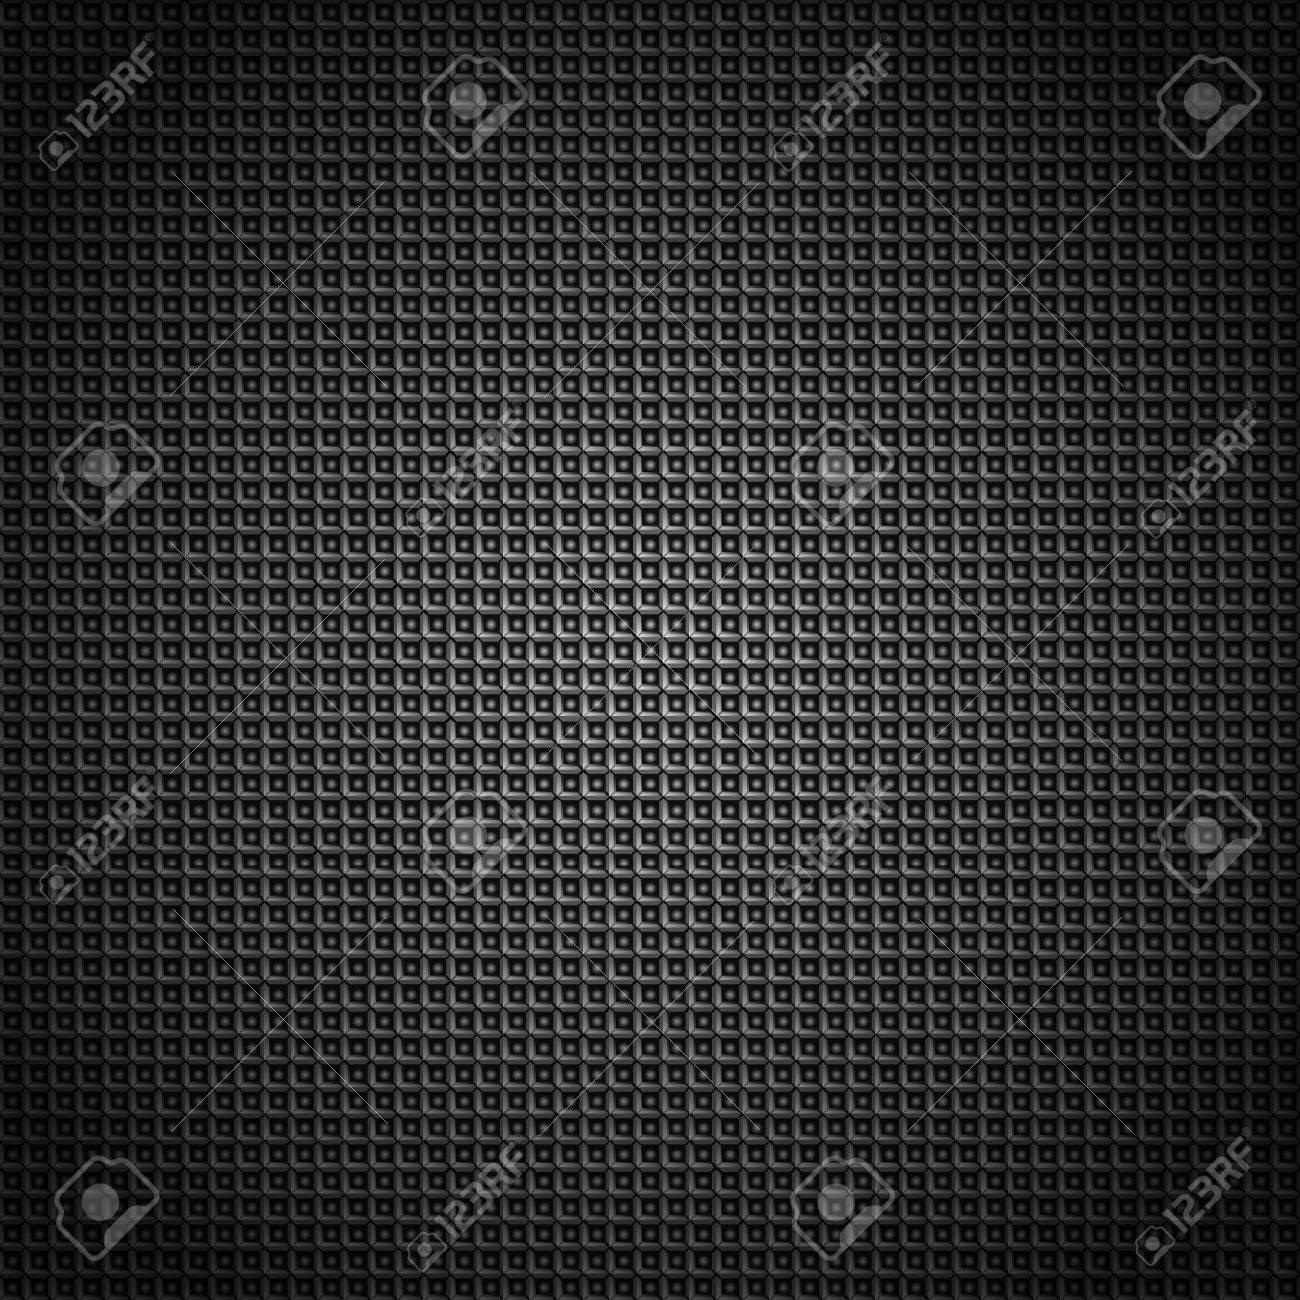 Metallic background with texture, eps 10 Stock Vector - 12178548